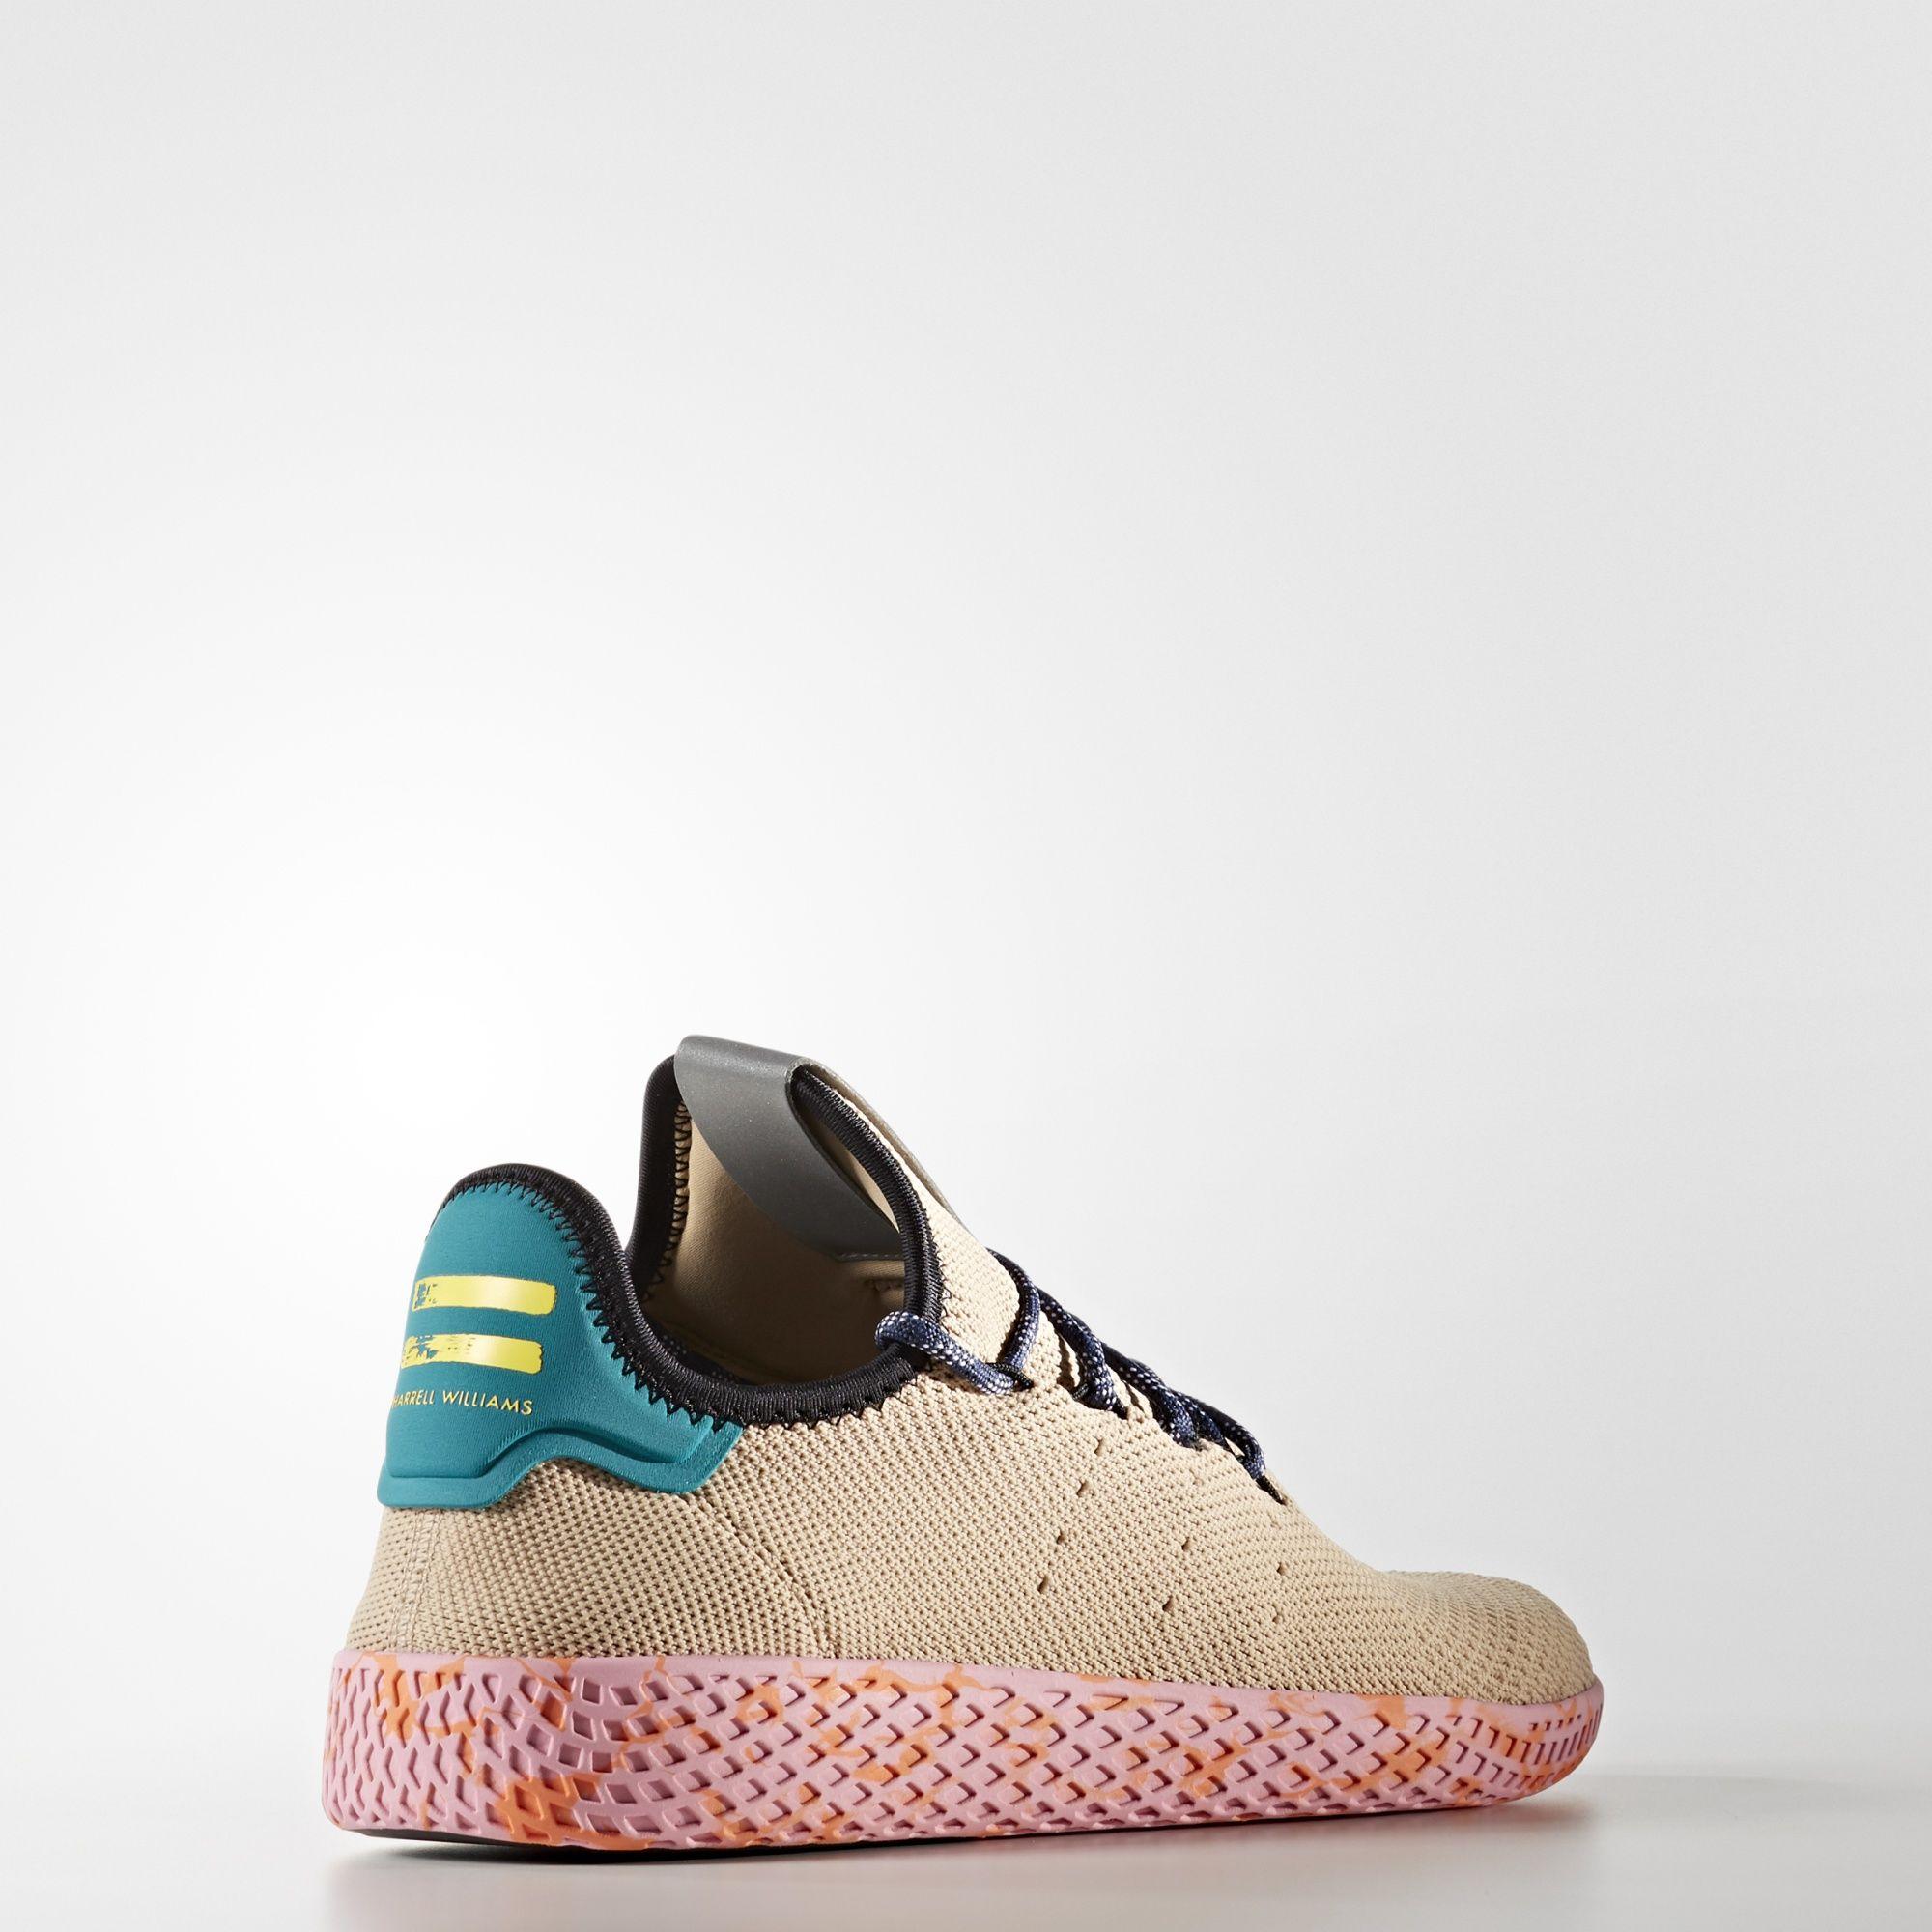 BY2672 Pharrell Williams x adidas Tennis HU Nomad Yellow 3